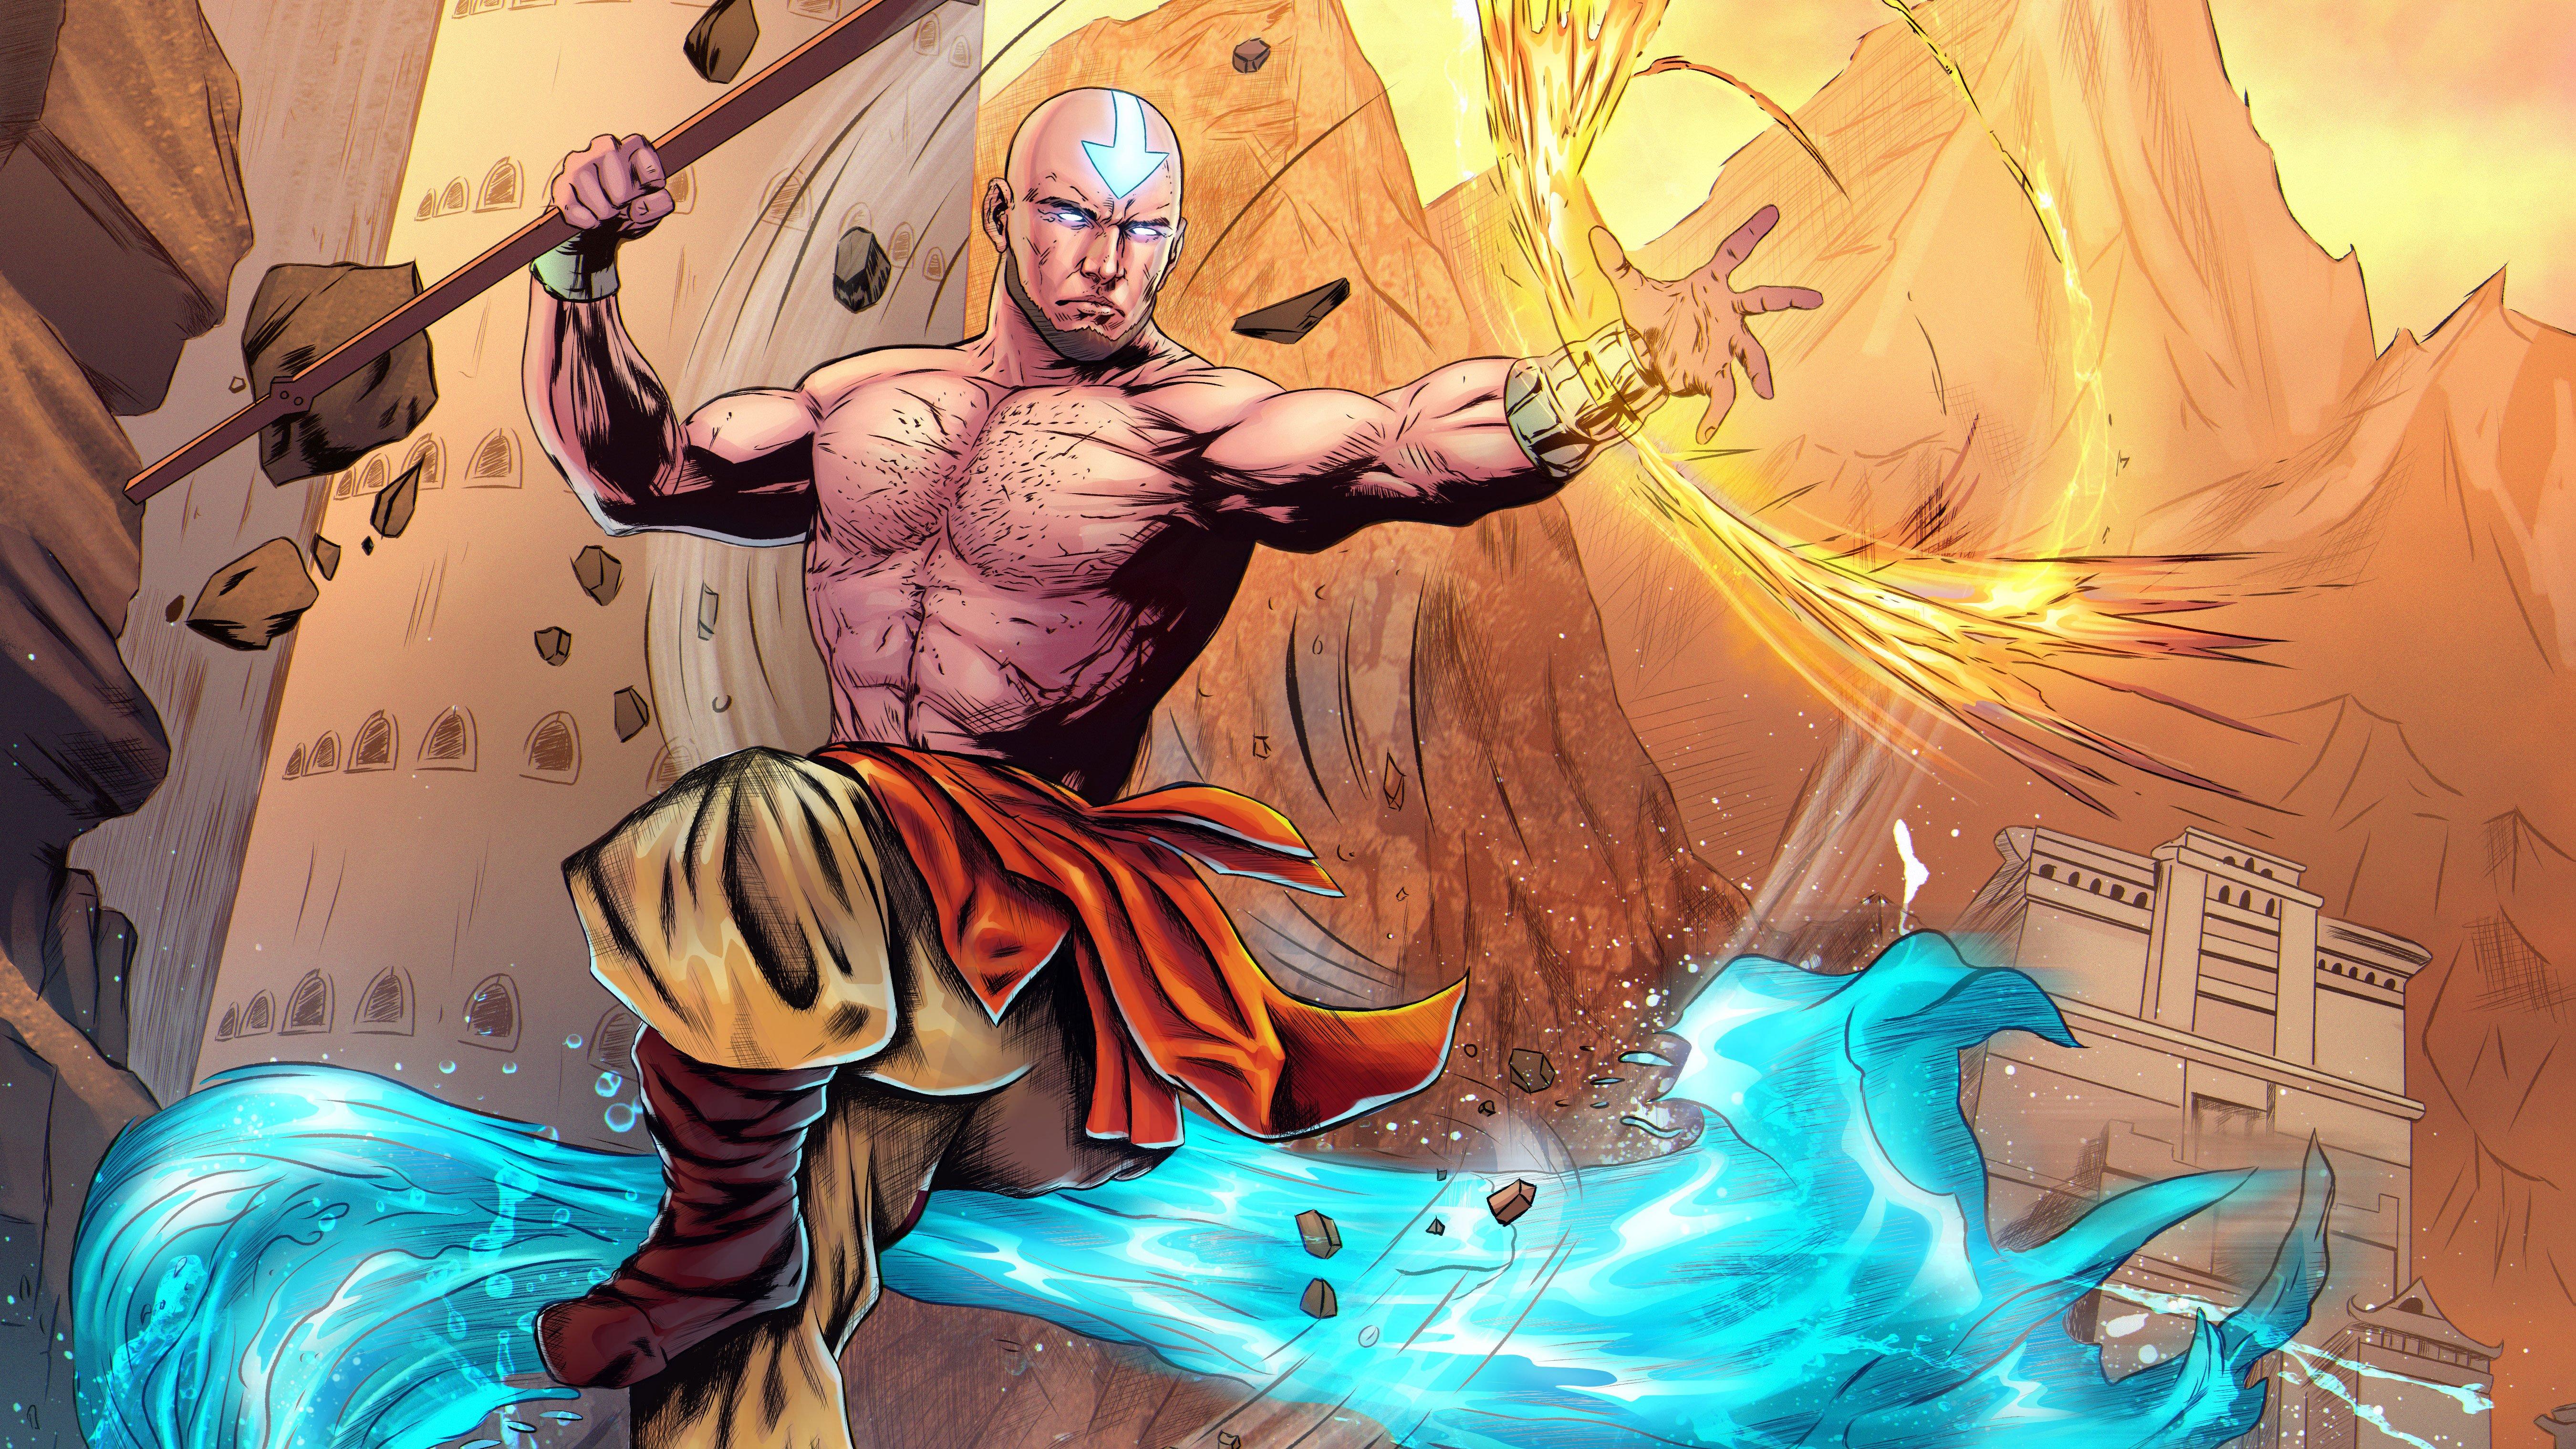 Anime Wallpaper Avatar: The Last Airbender Fanart